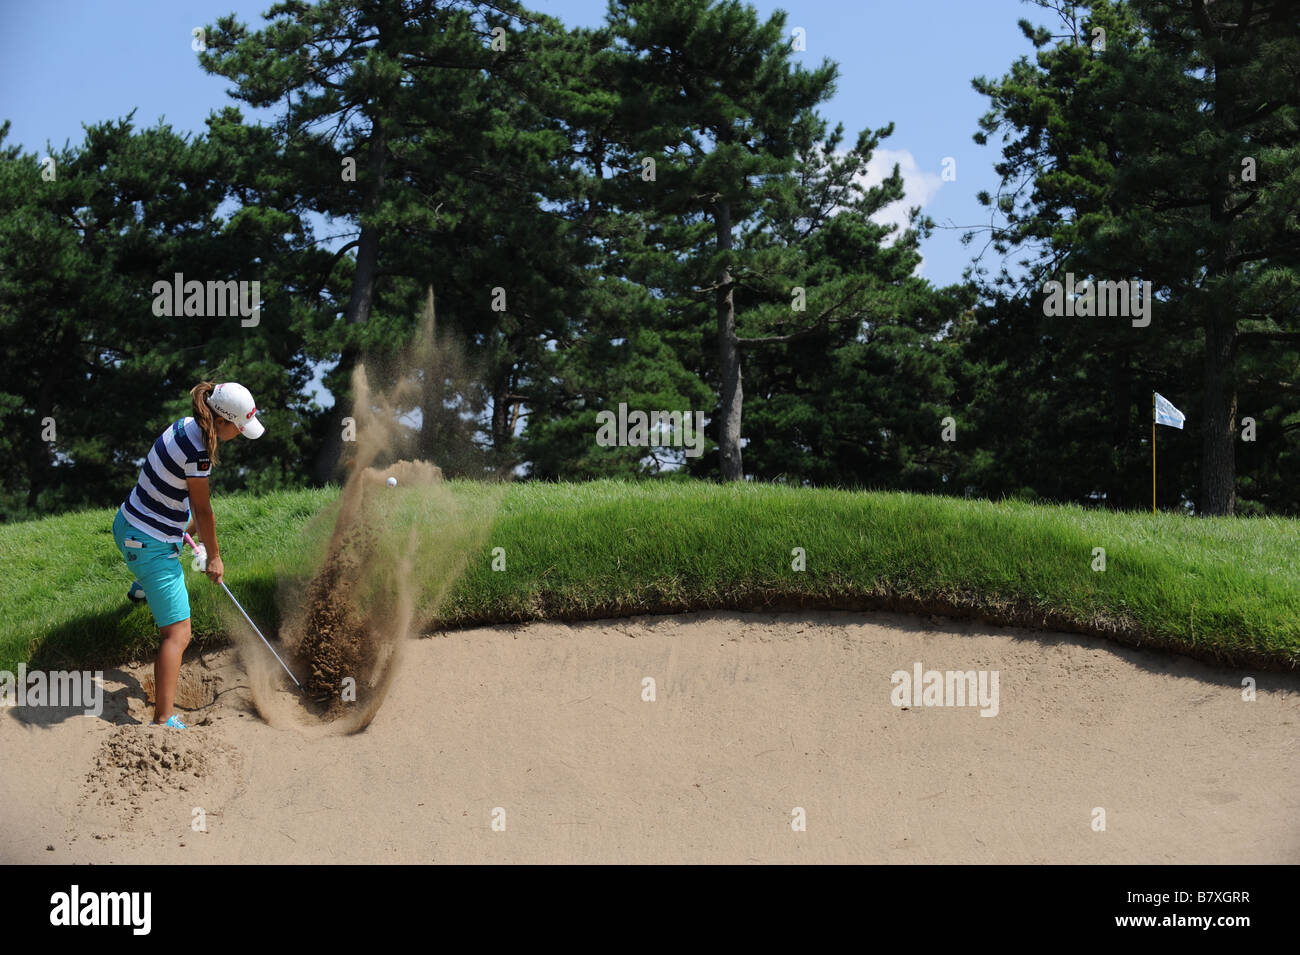 Momoko Ueda SEPTEMBER 14 2008 Golf LPGA Championship 2008 Konica Minolta Cup at Katayamazu Golf Club Ishikawa Japan - Stock Image